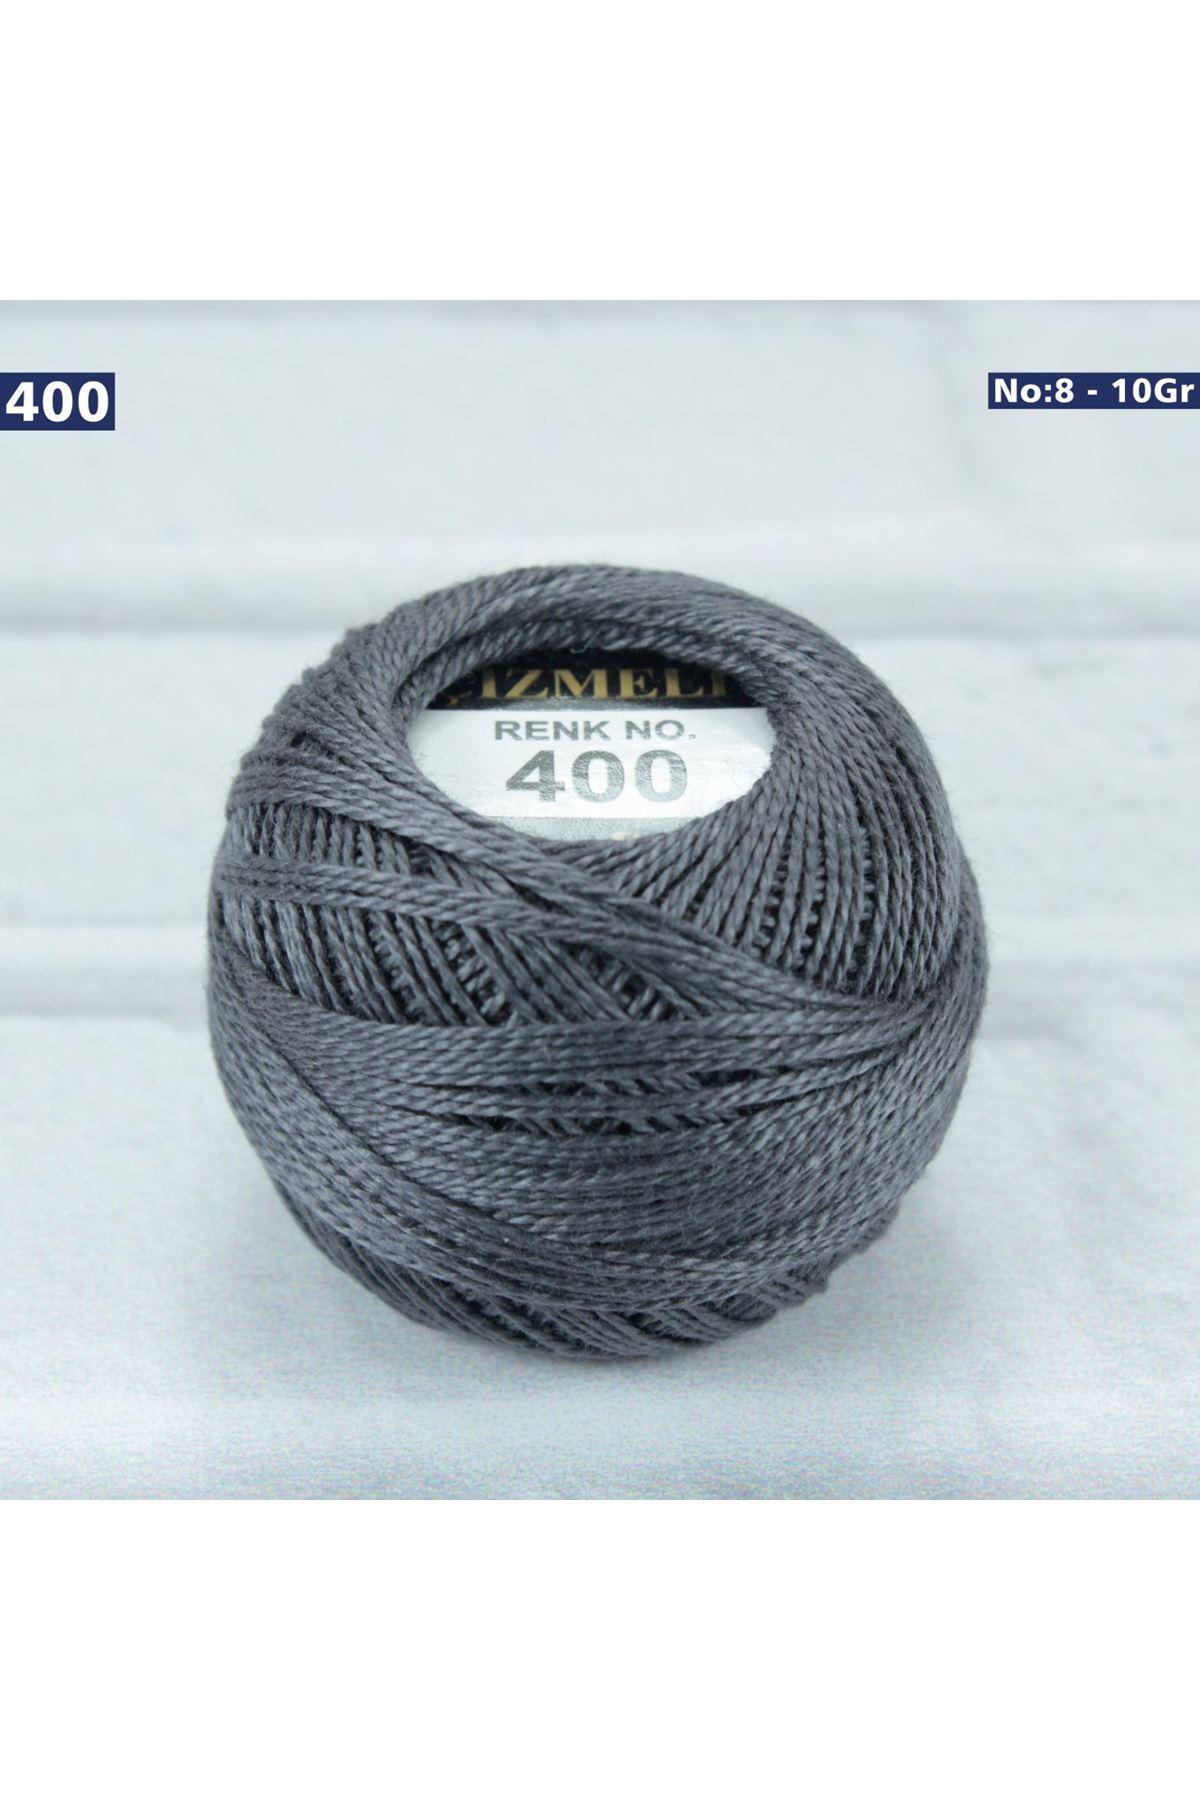 Çizmeli Cotton Perle Nakış İpliği No: 400